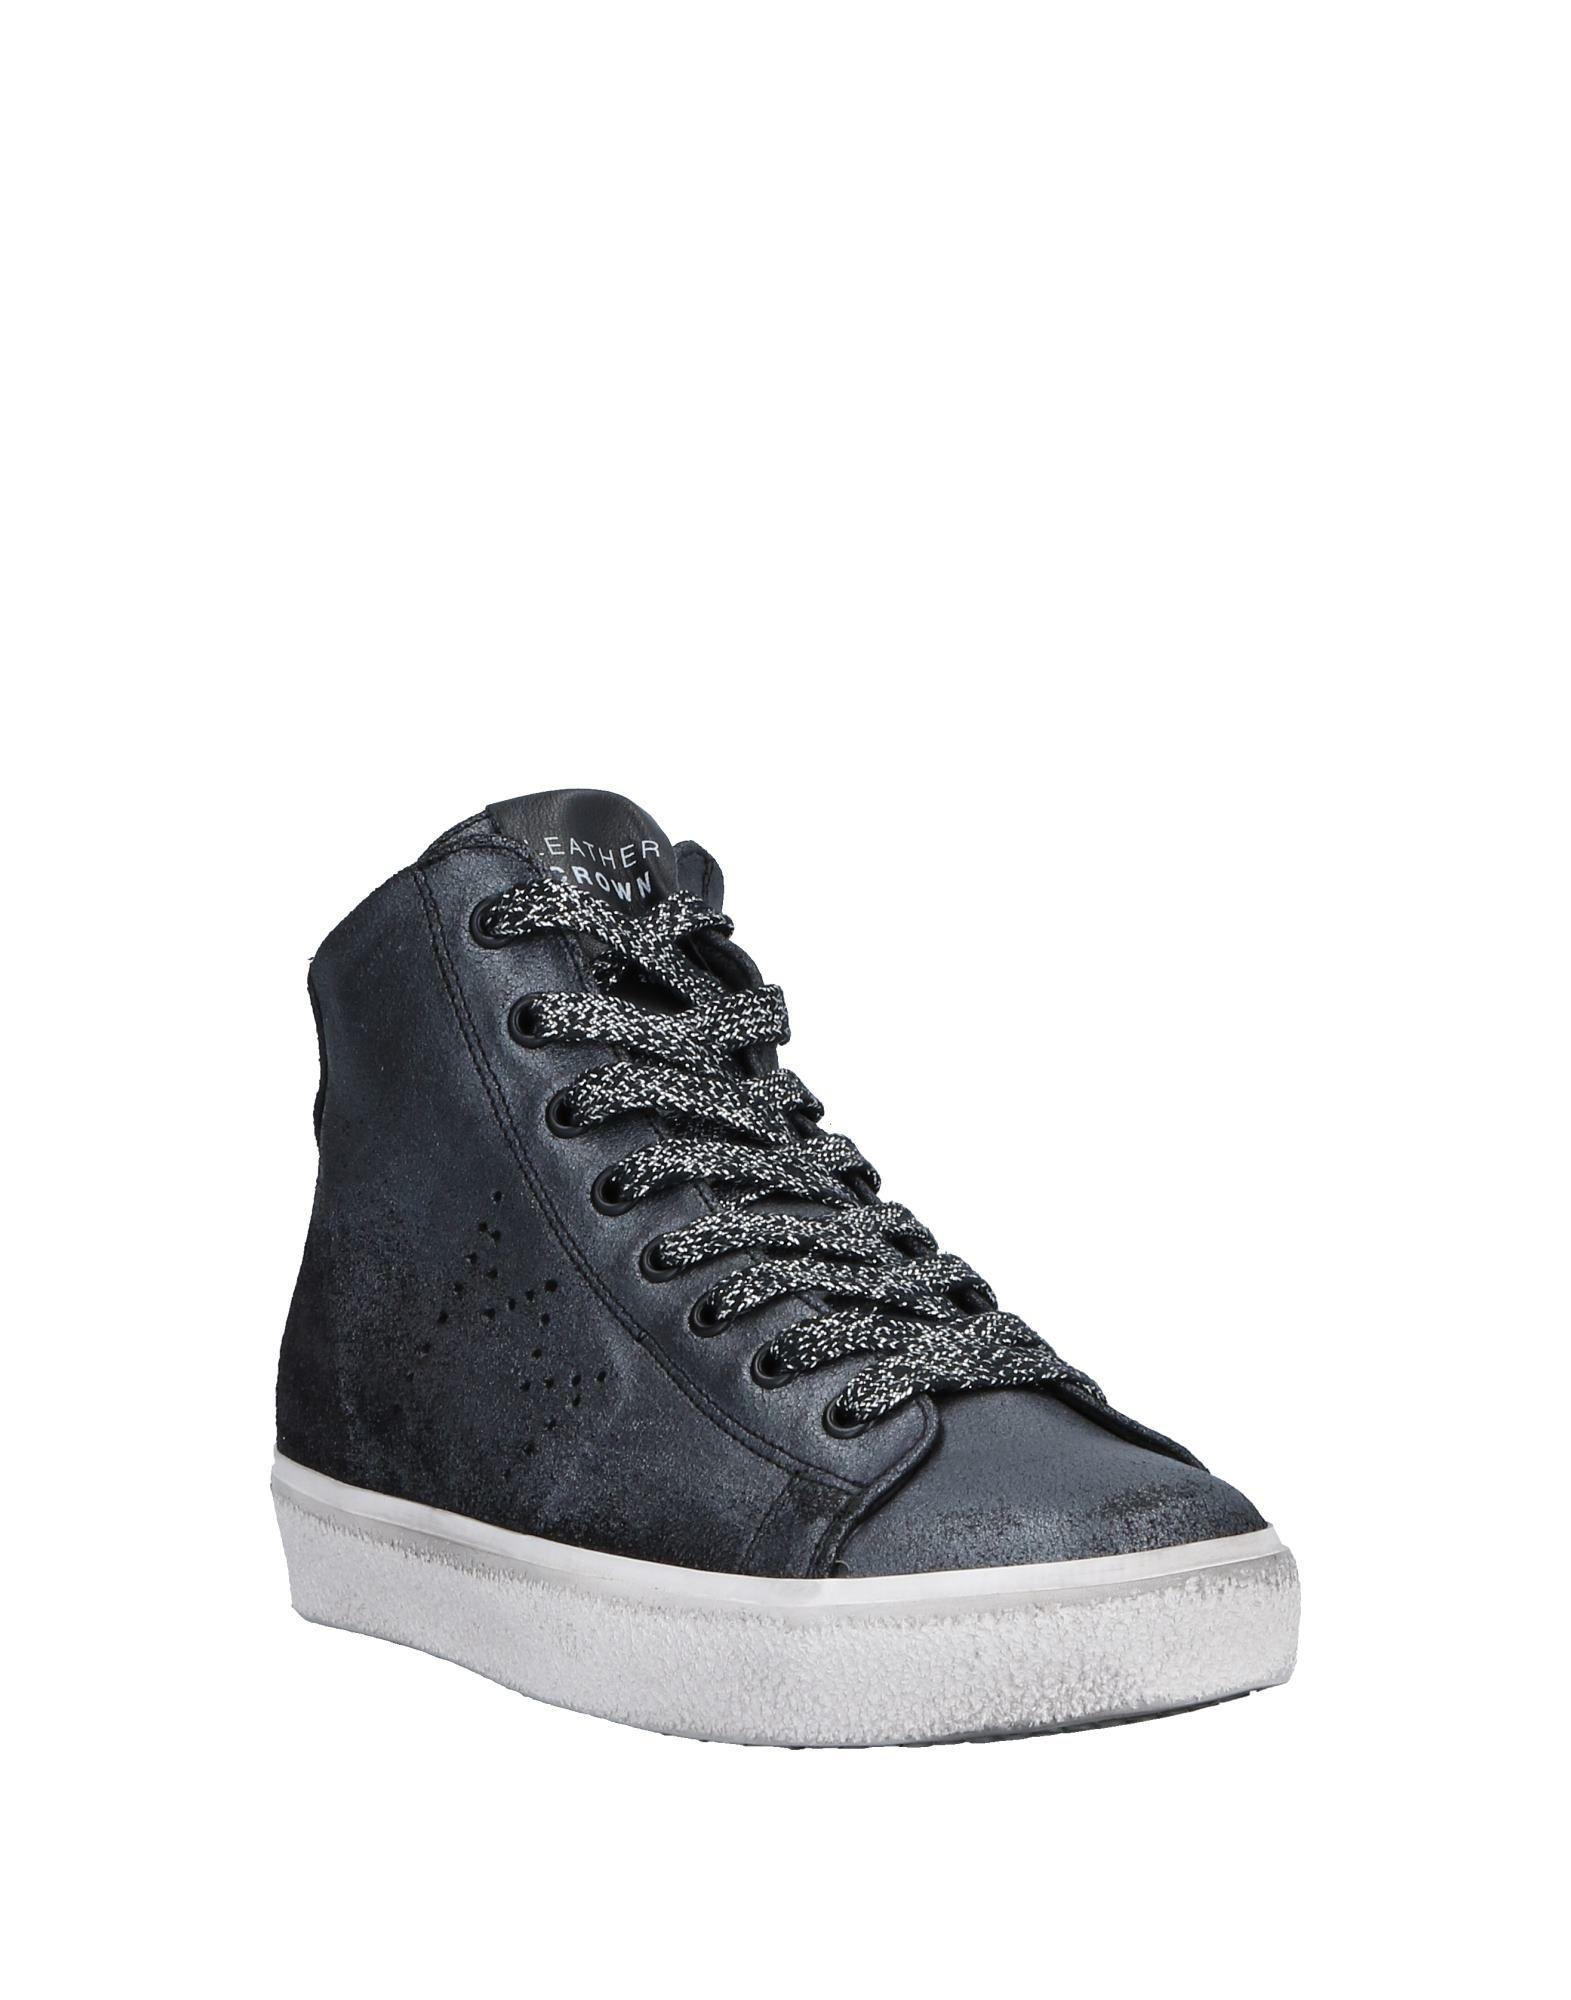 Stilvolle Sneakers billige Schuhe Leder Crown Sneakers Stilvolle Damen  11531766BV 231bdc